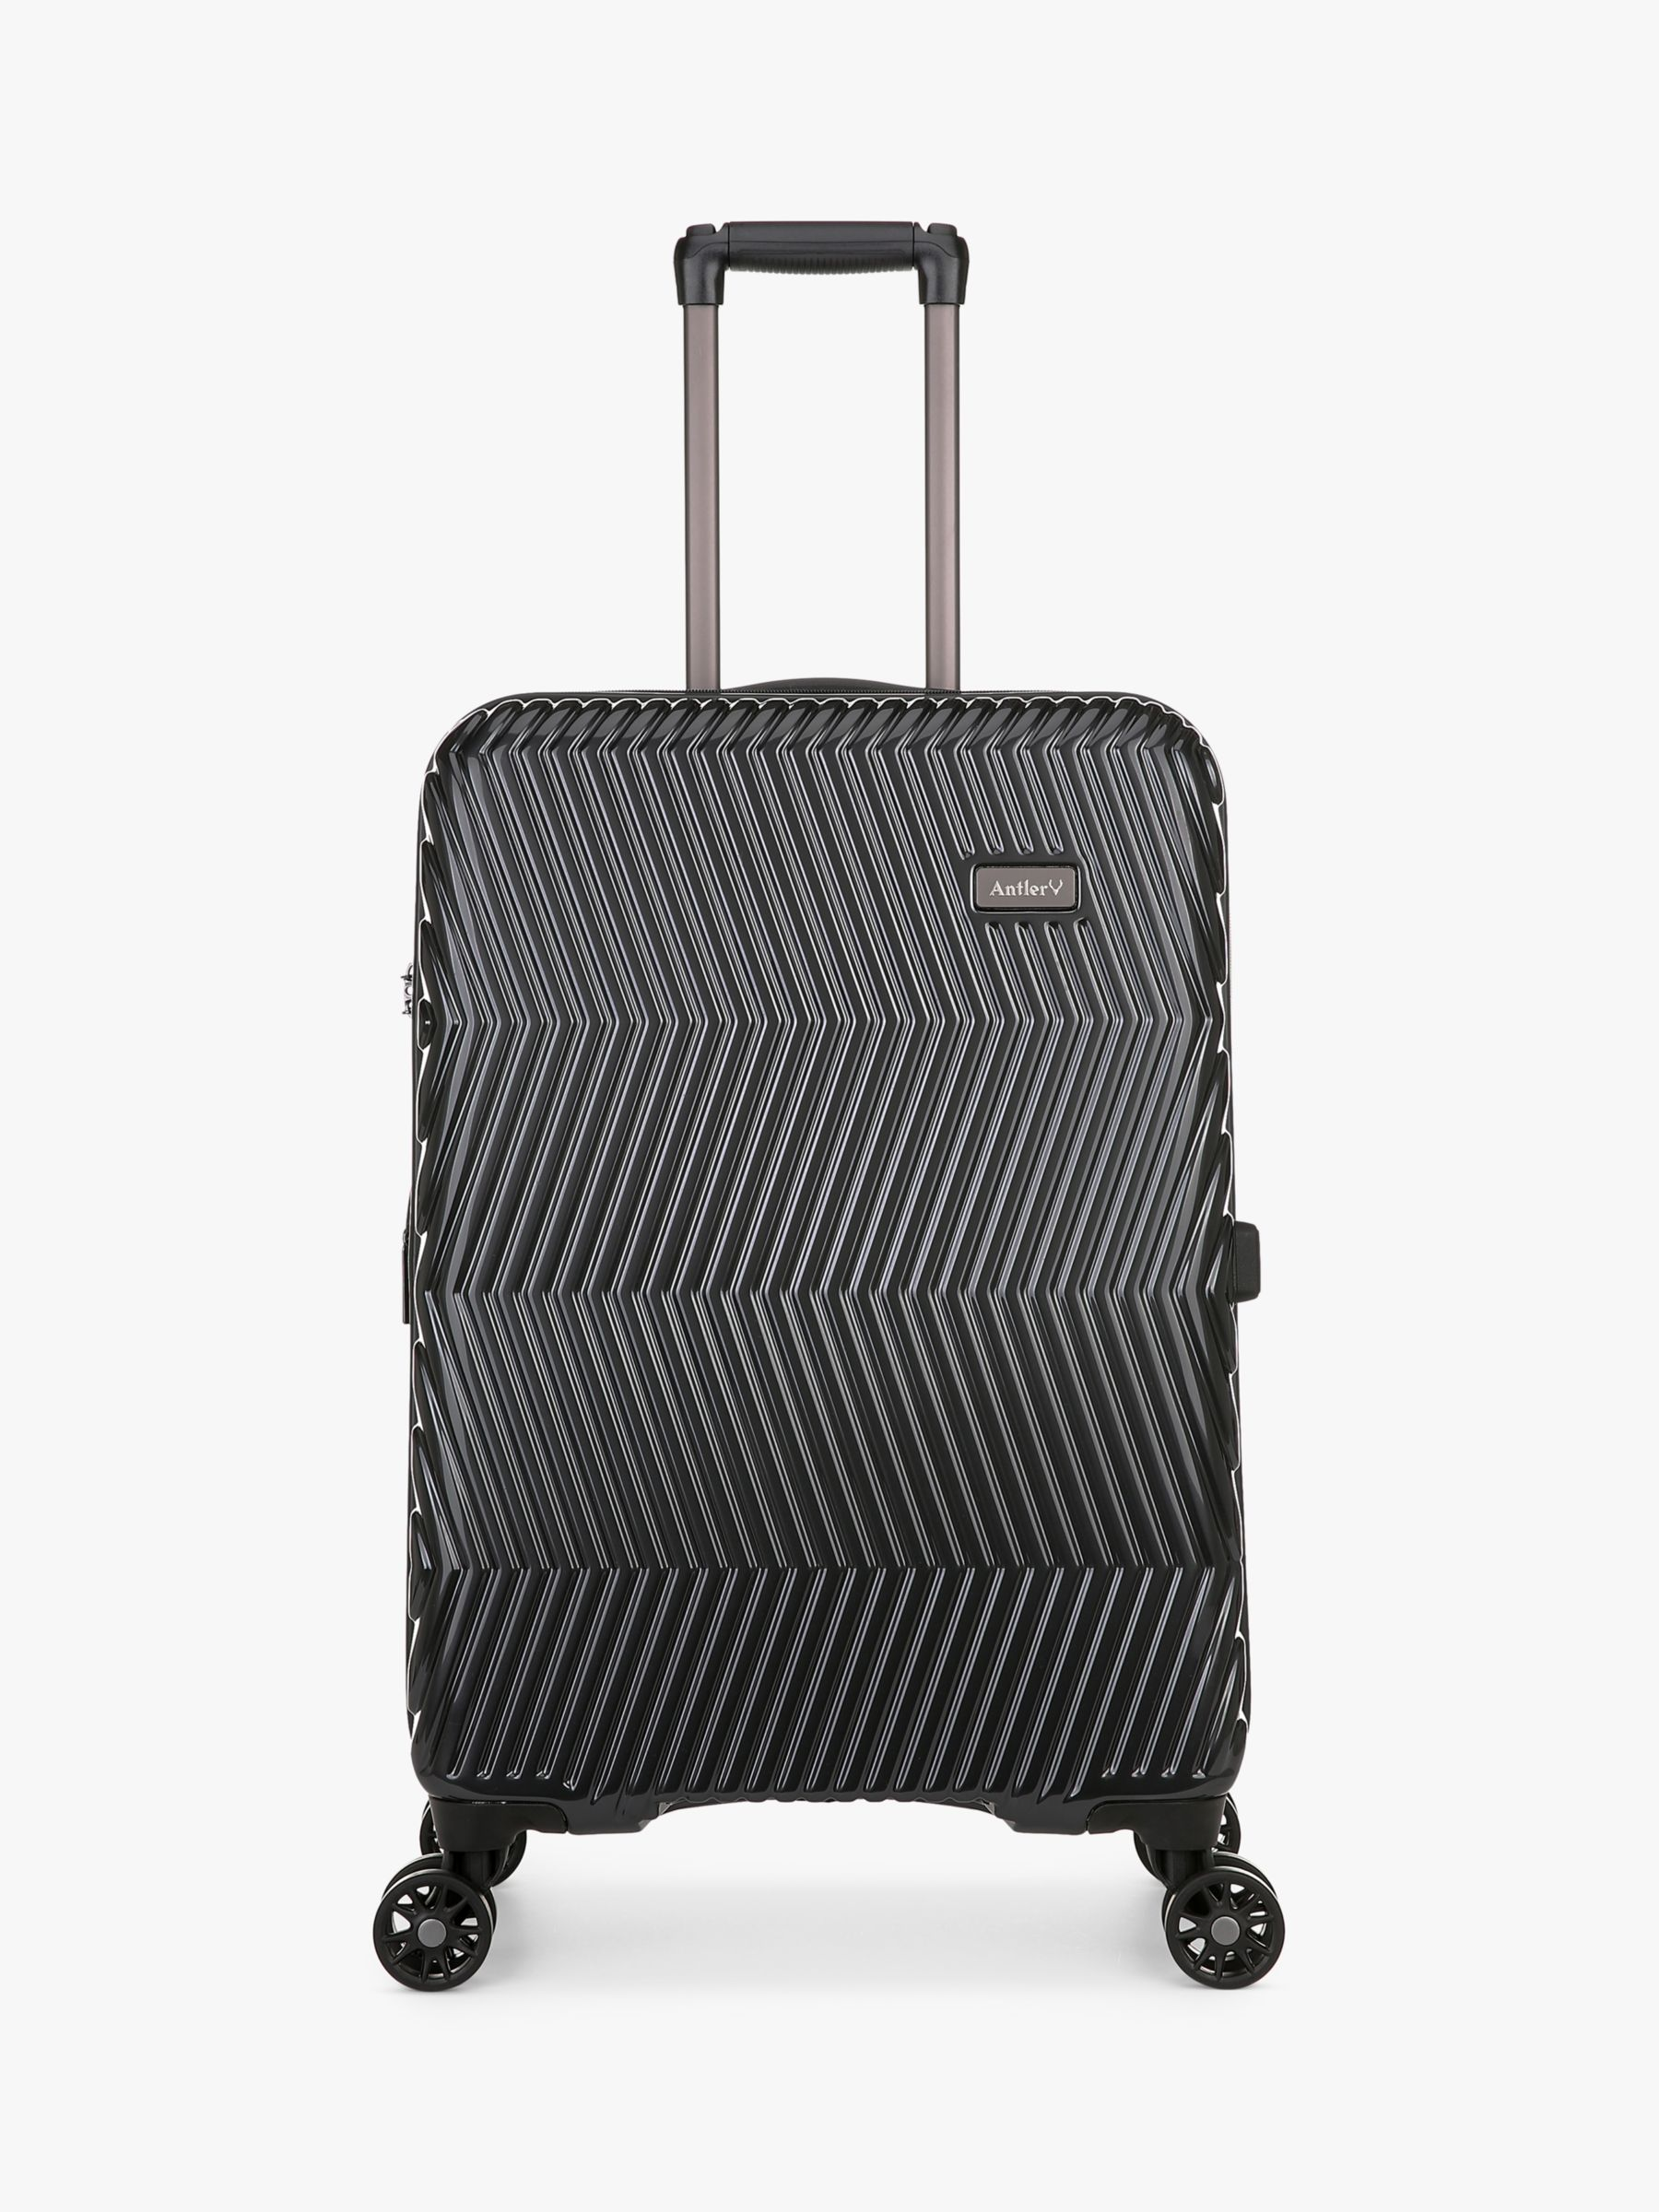 Antler Antler Viva 4-Wheel 68cm Medium Suitcase